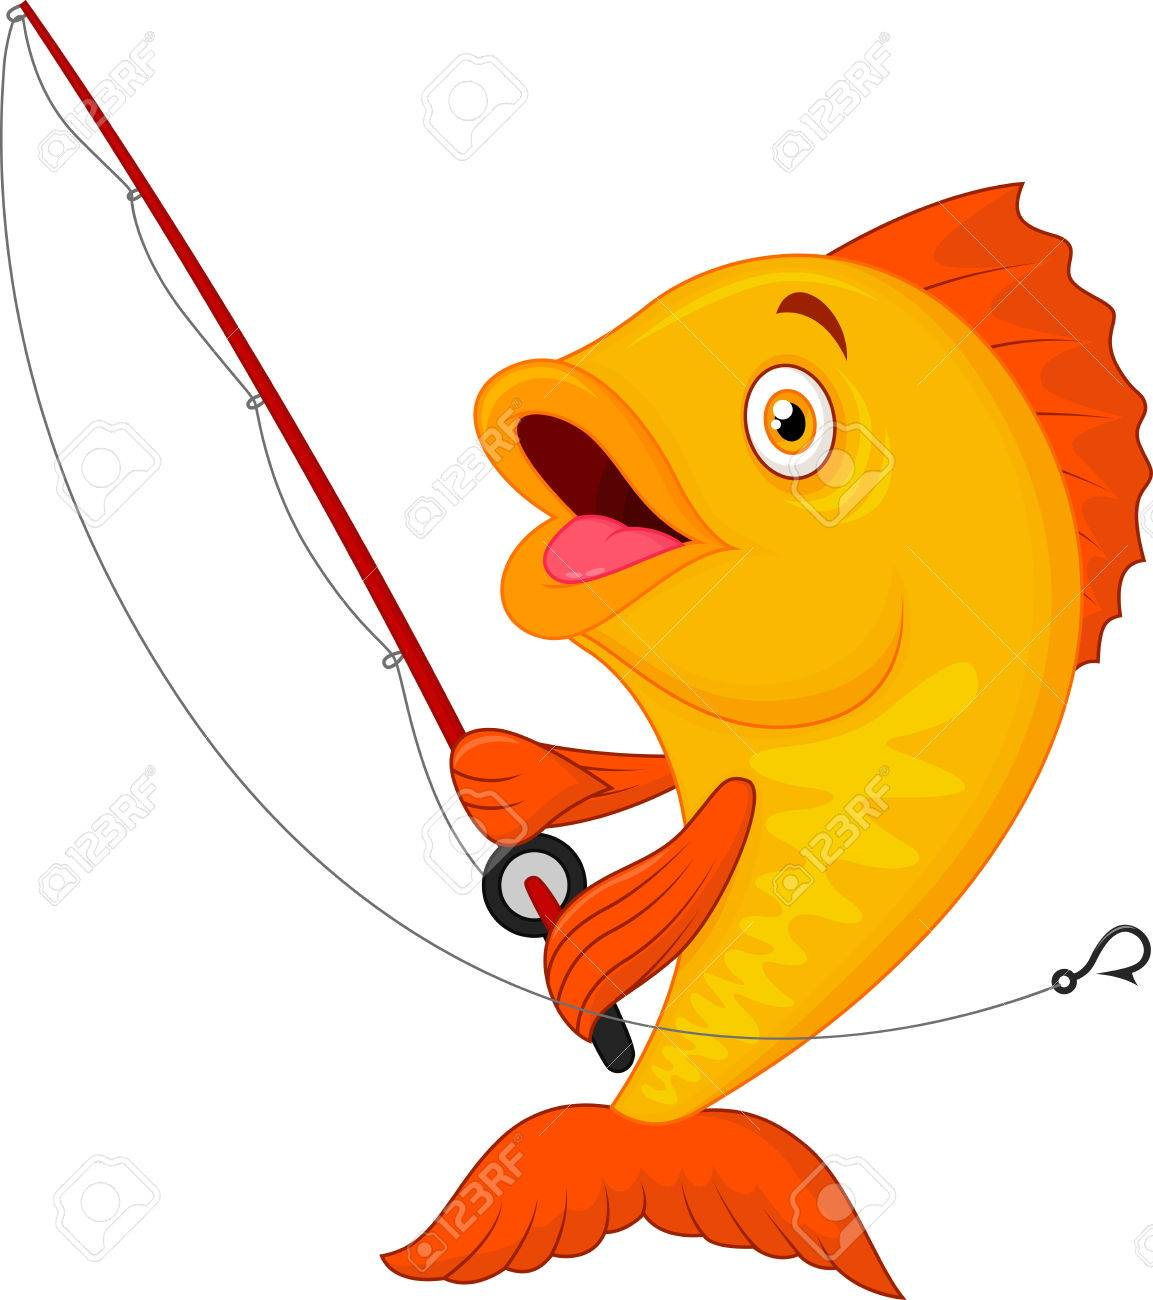 cute cartoon fish holding fishing rod royalty free cliparts